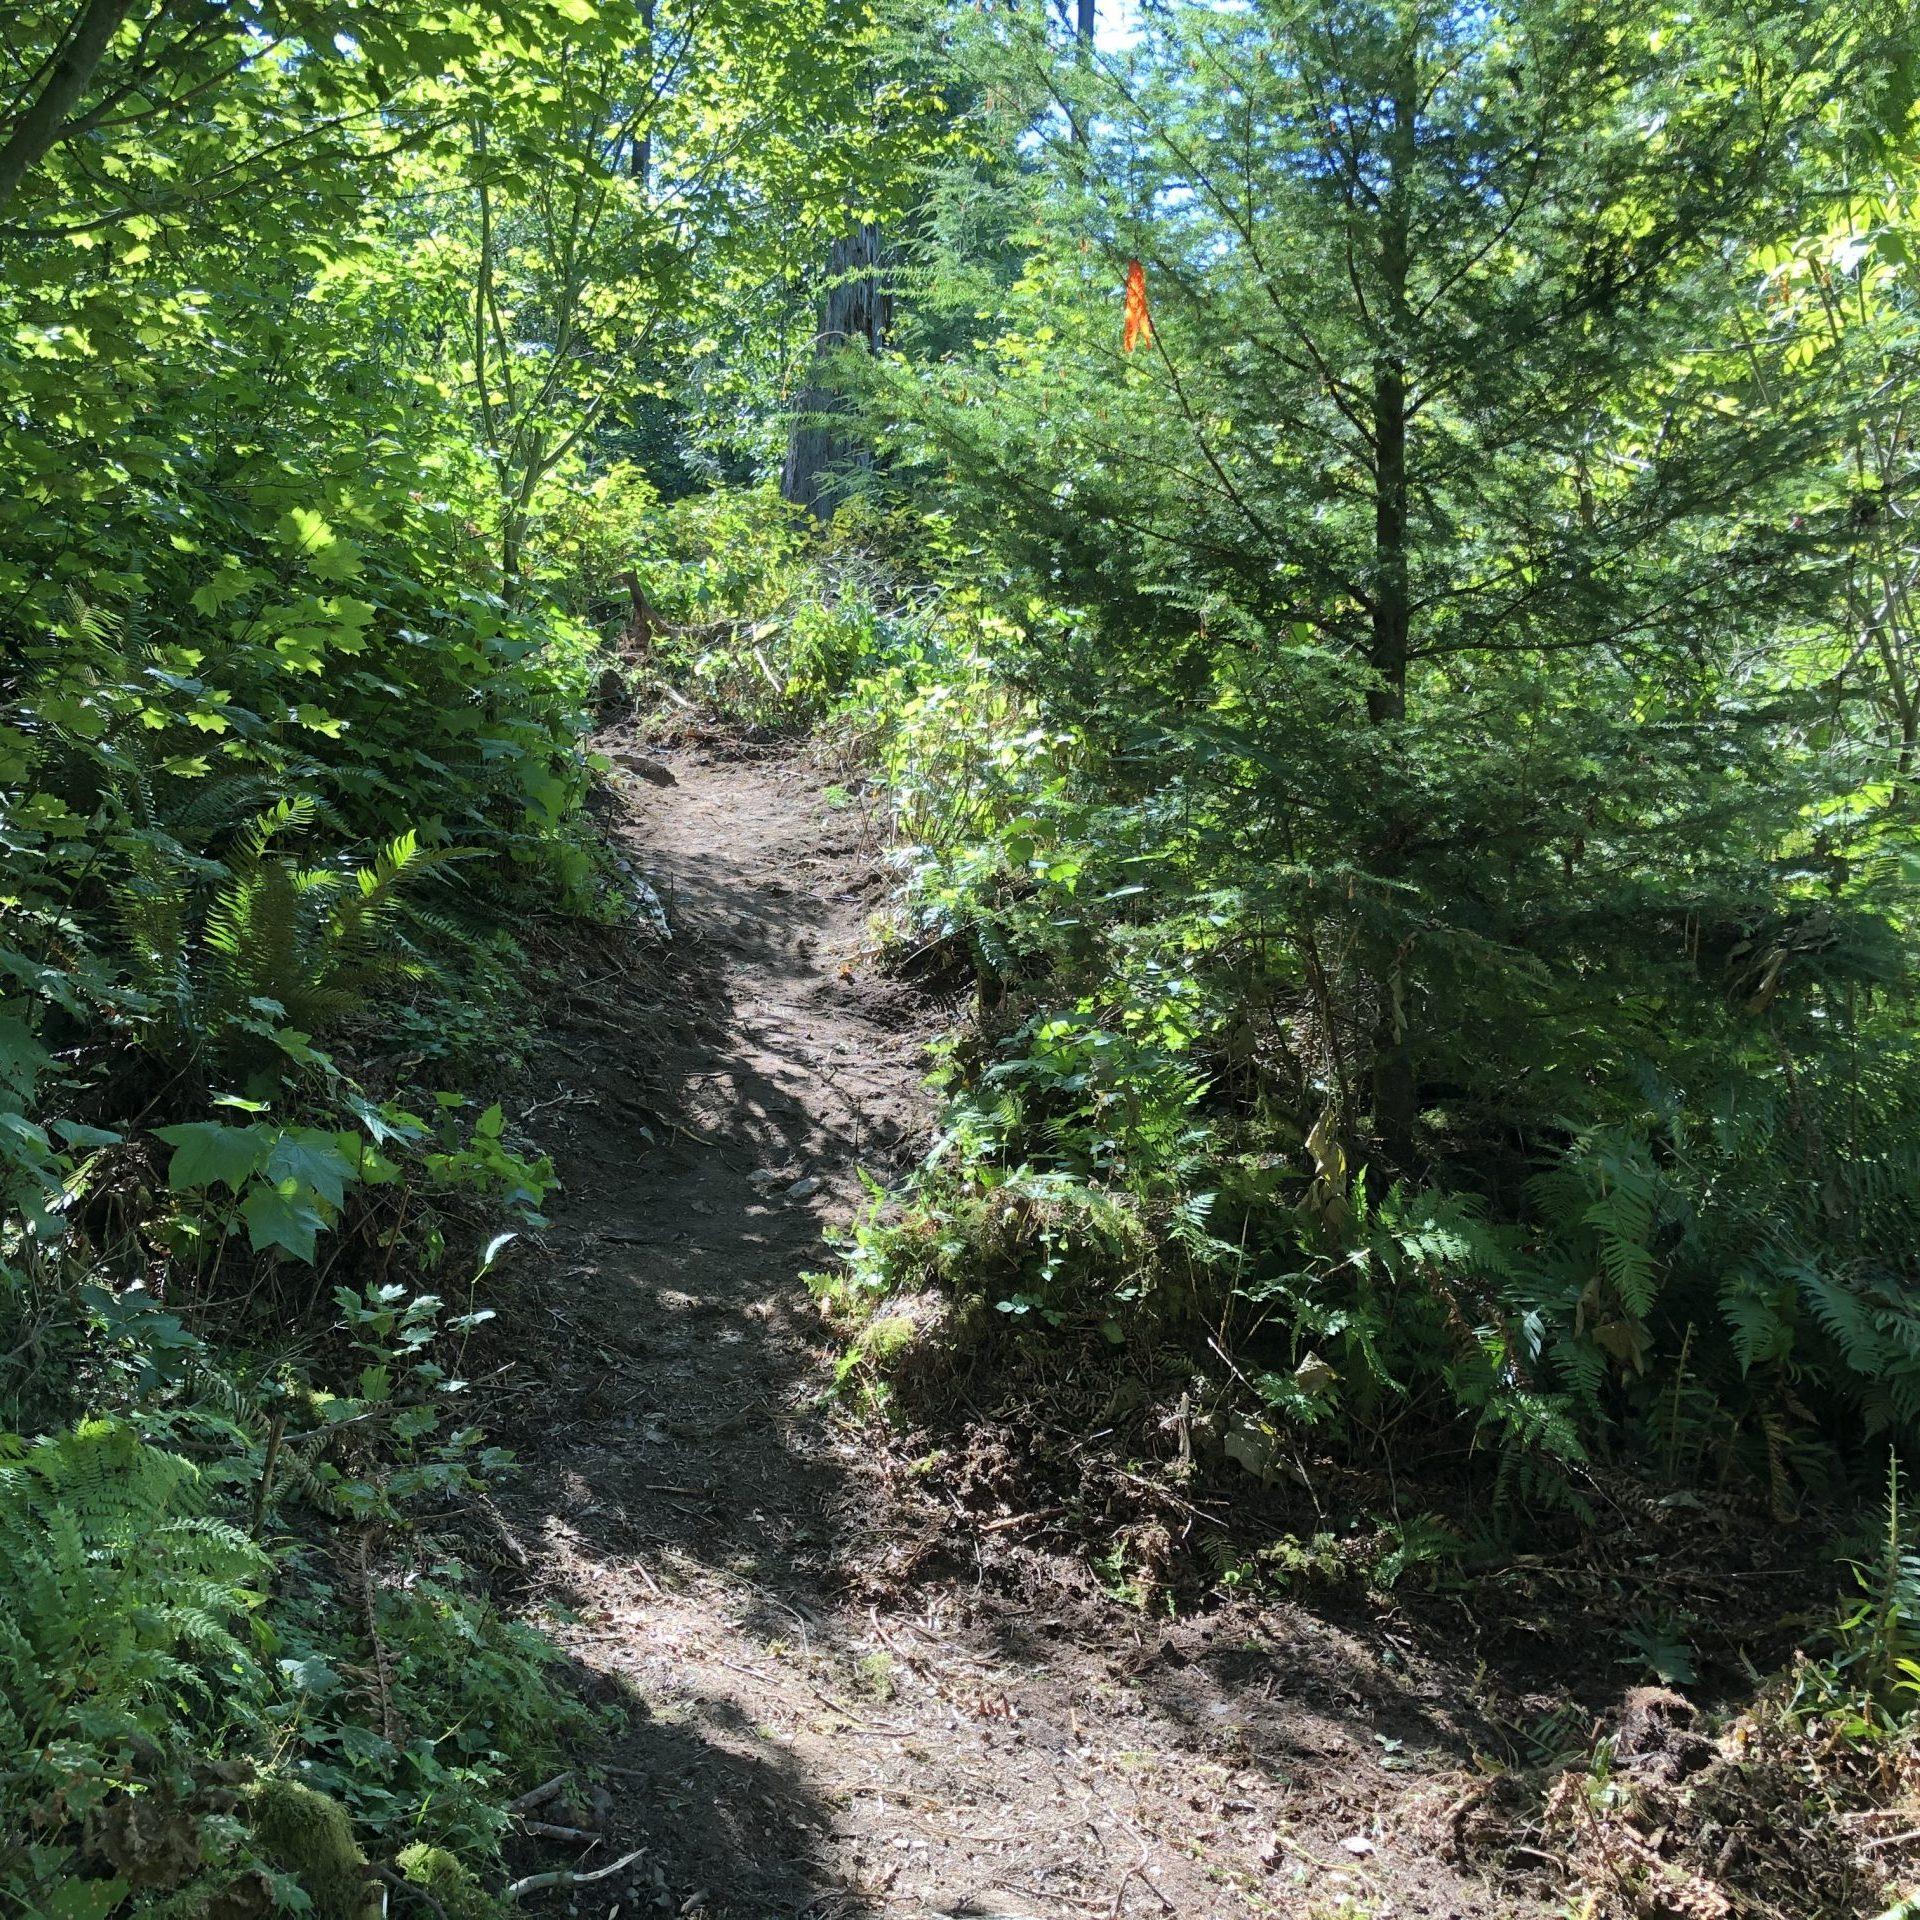 A dirt trail in dappled sunlight